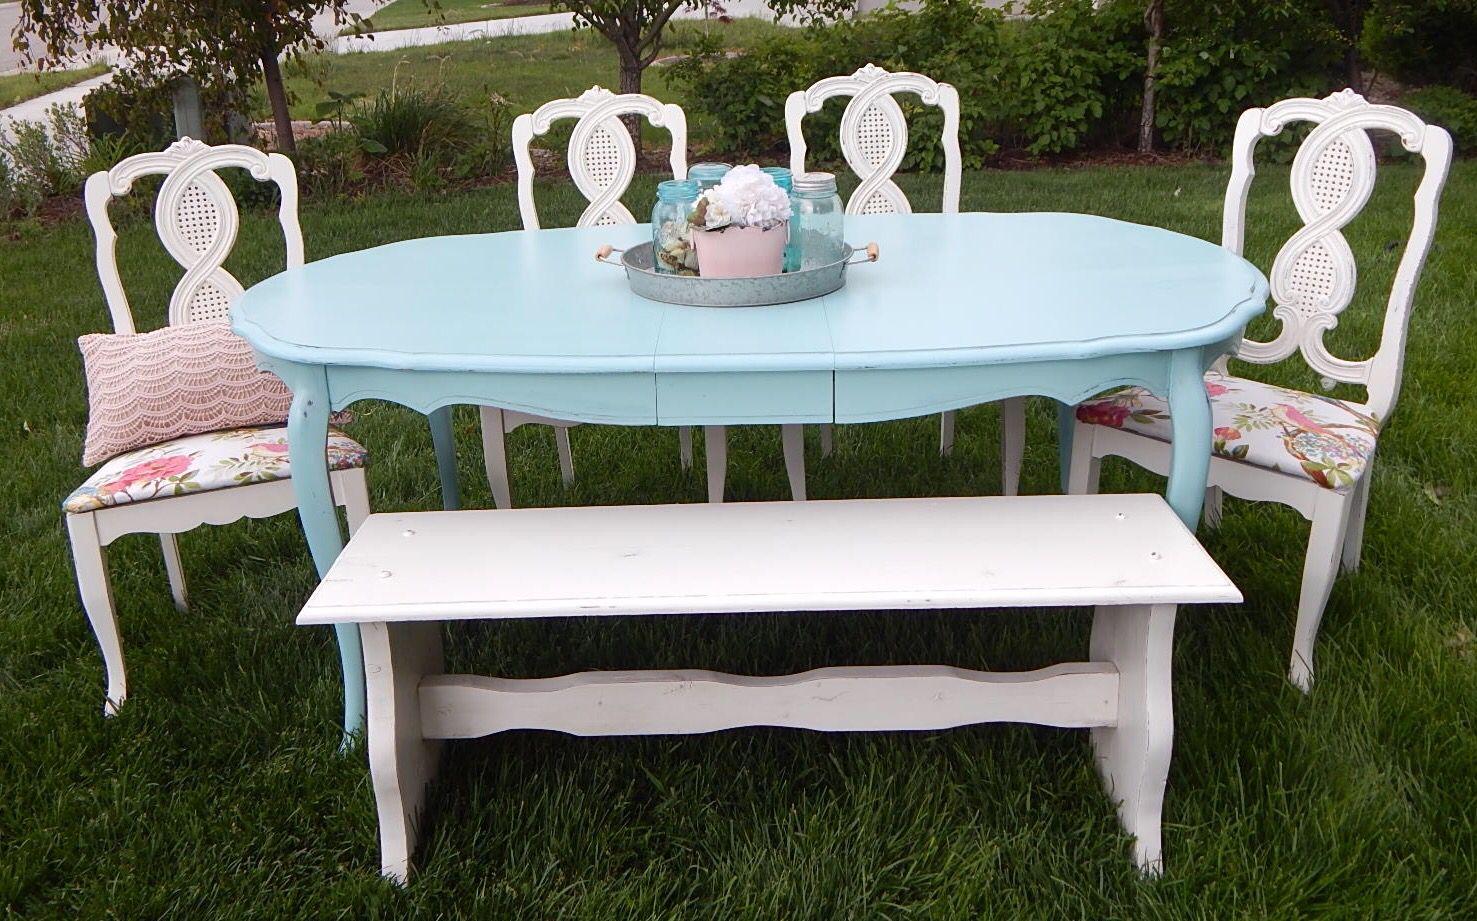 Brilliant Refurbished Frenchie Vintage Dining Set Floral Fabric Pink Inzonedesignstudio Interior Chair Design Inzonedesignstudiocom